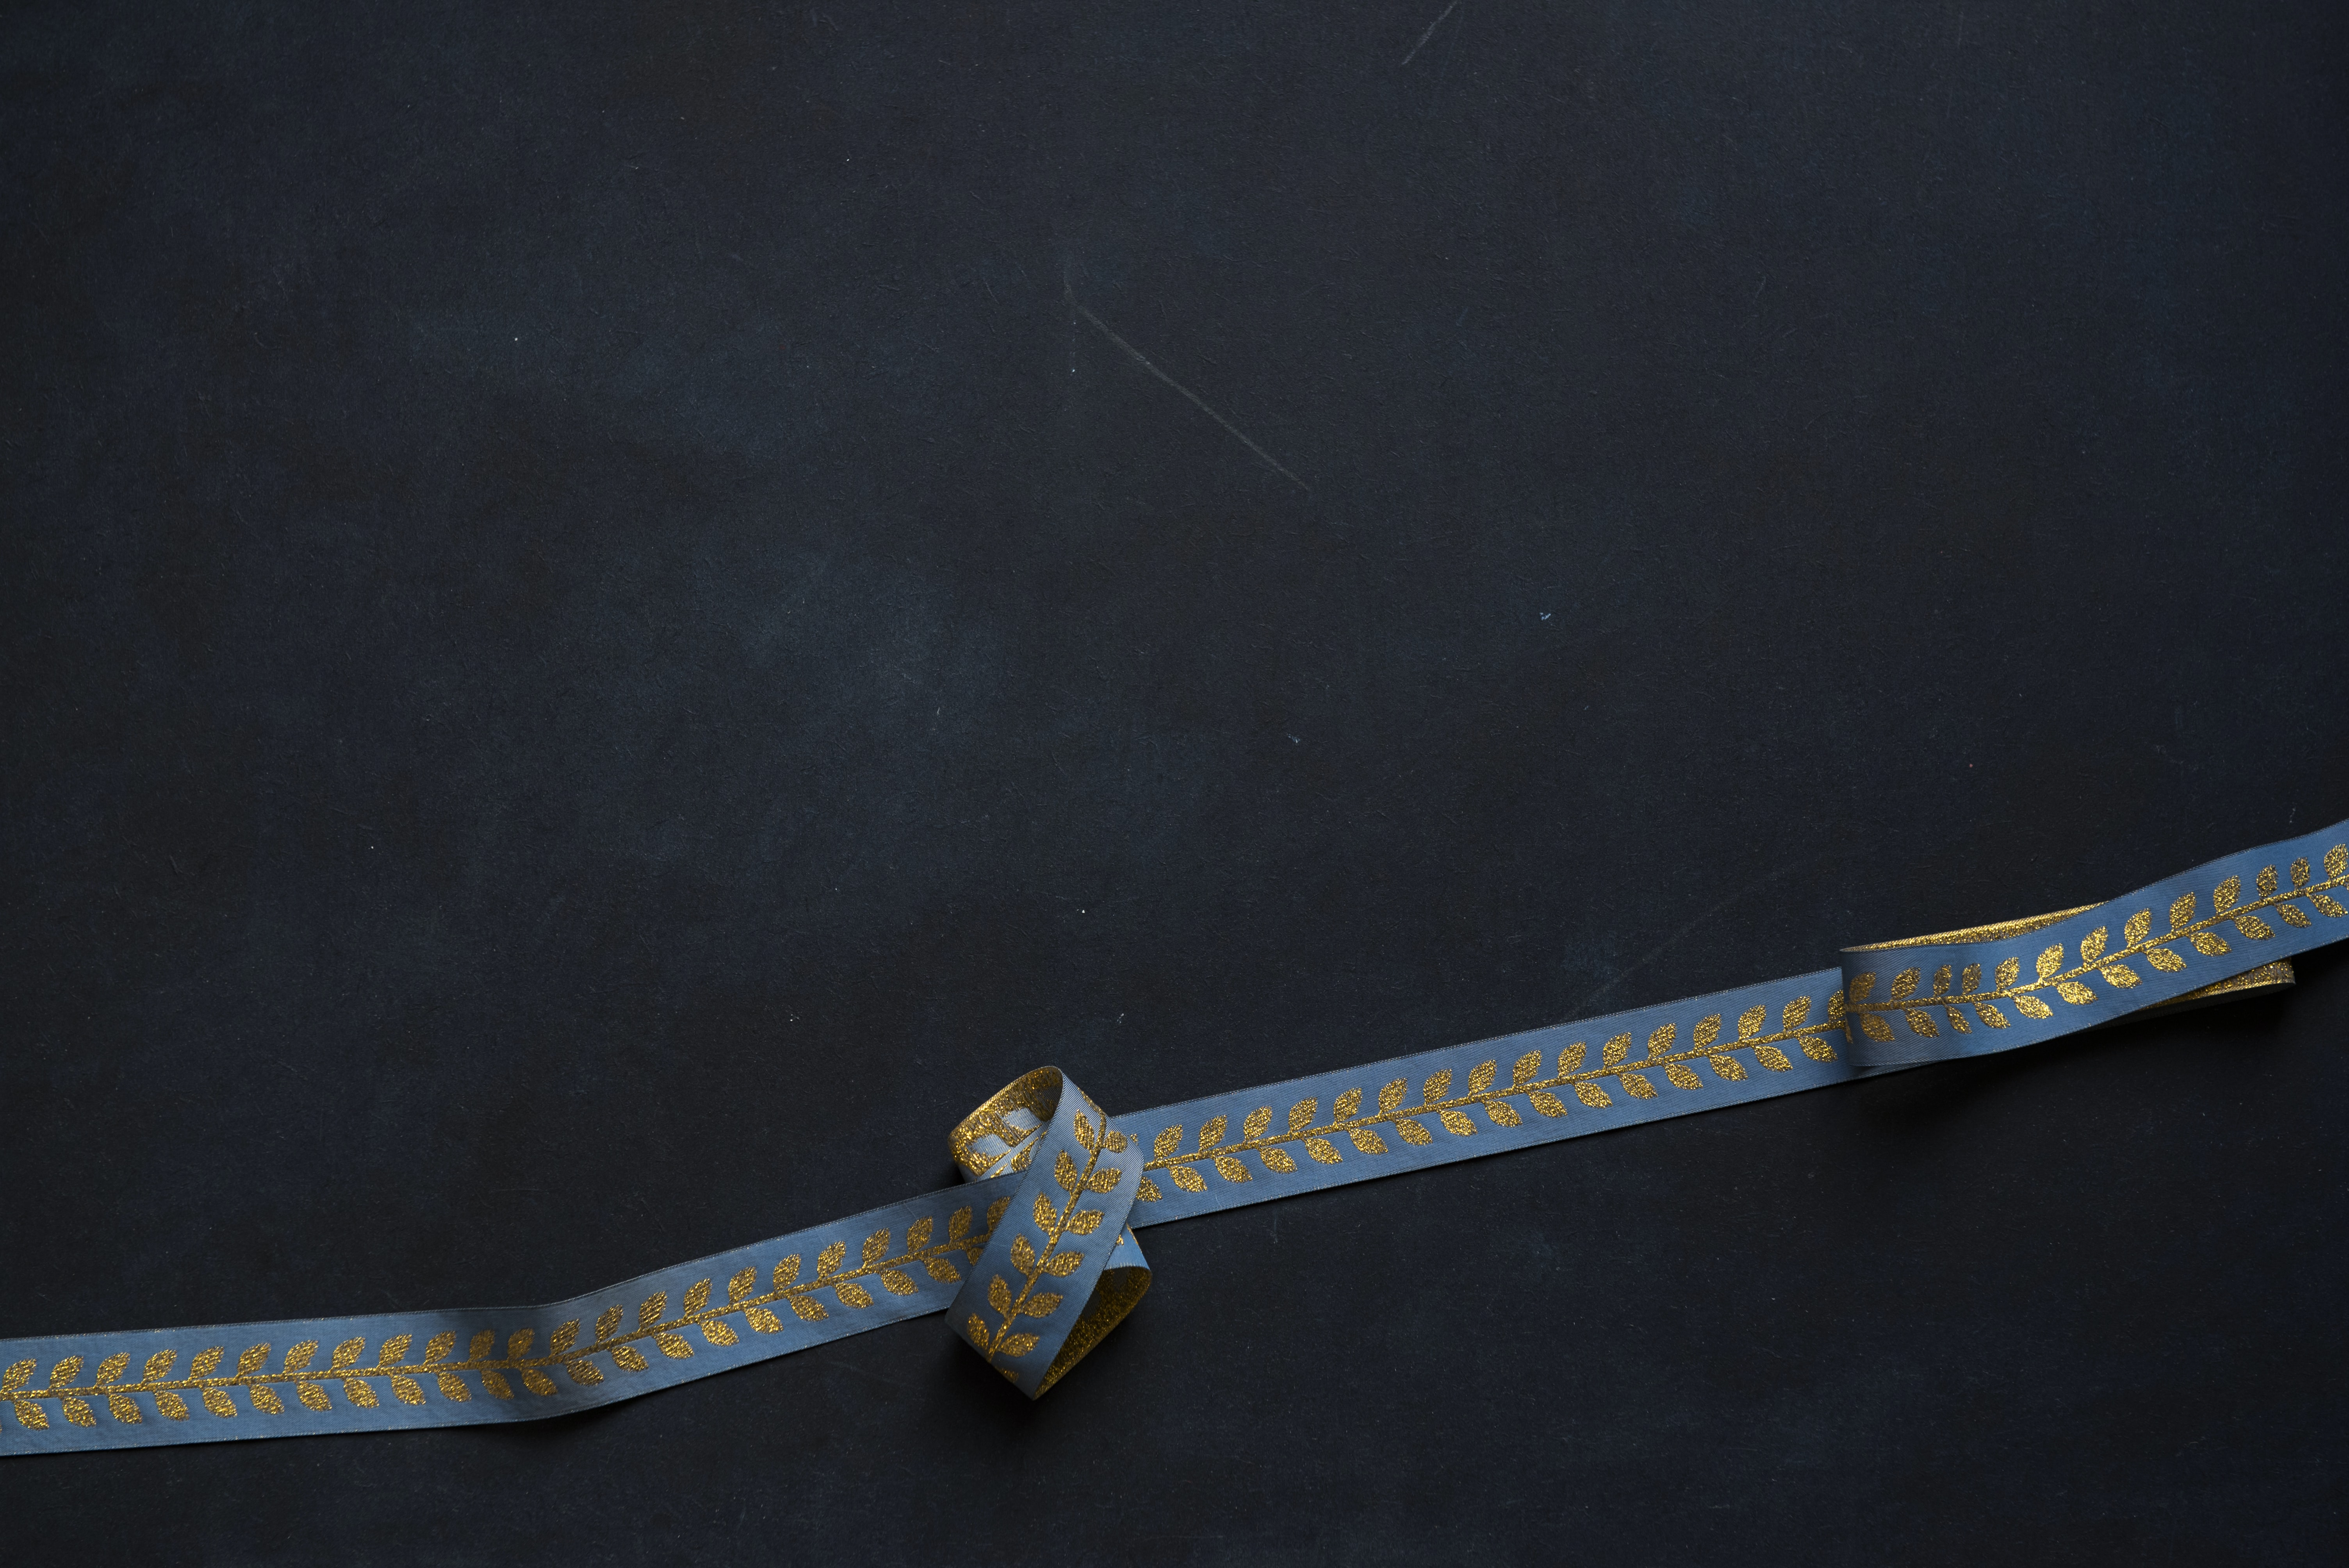 blue and beige floral strap on black surface